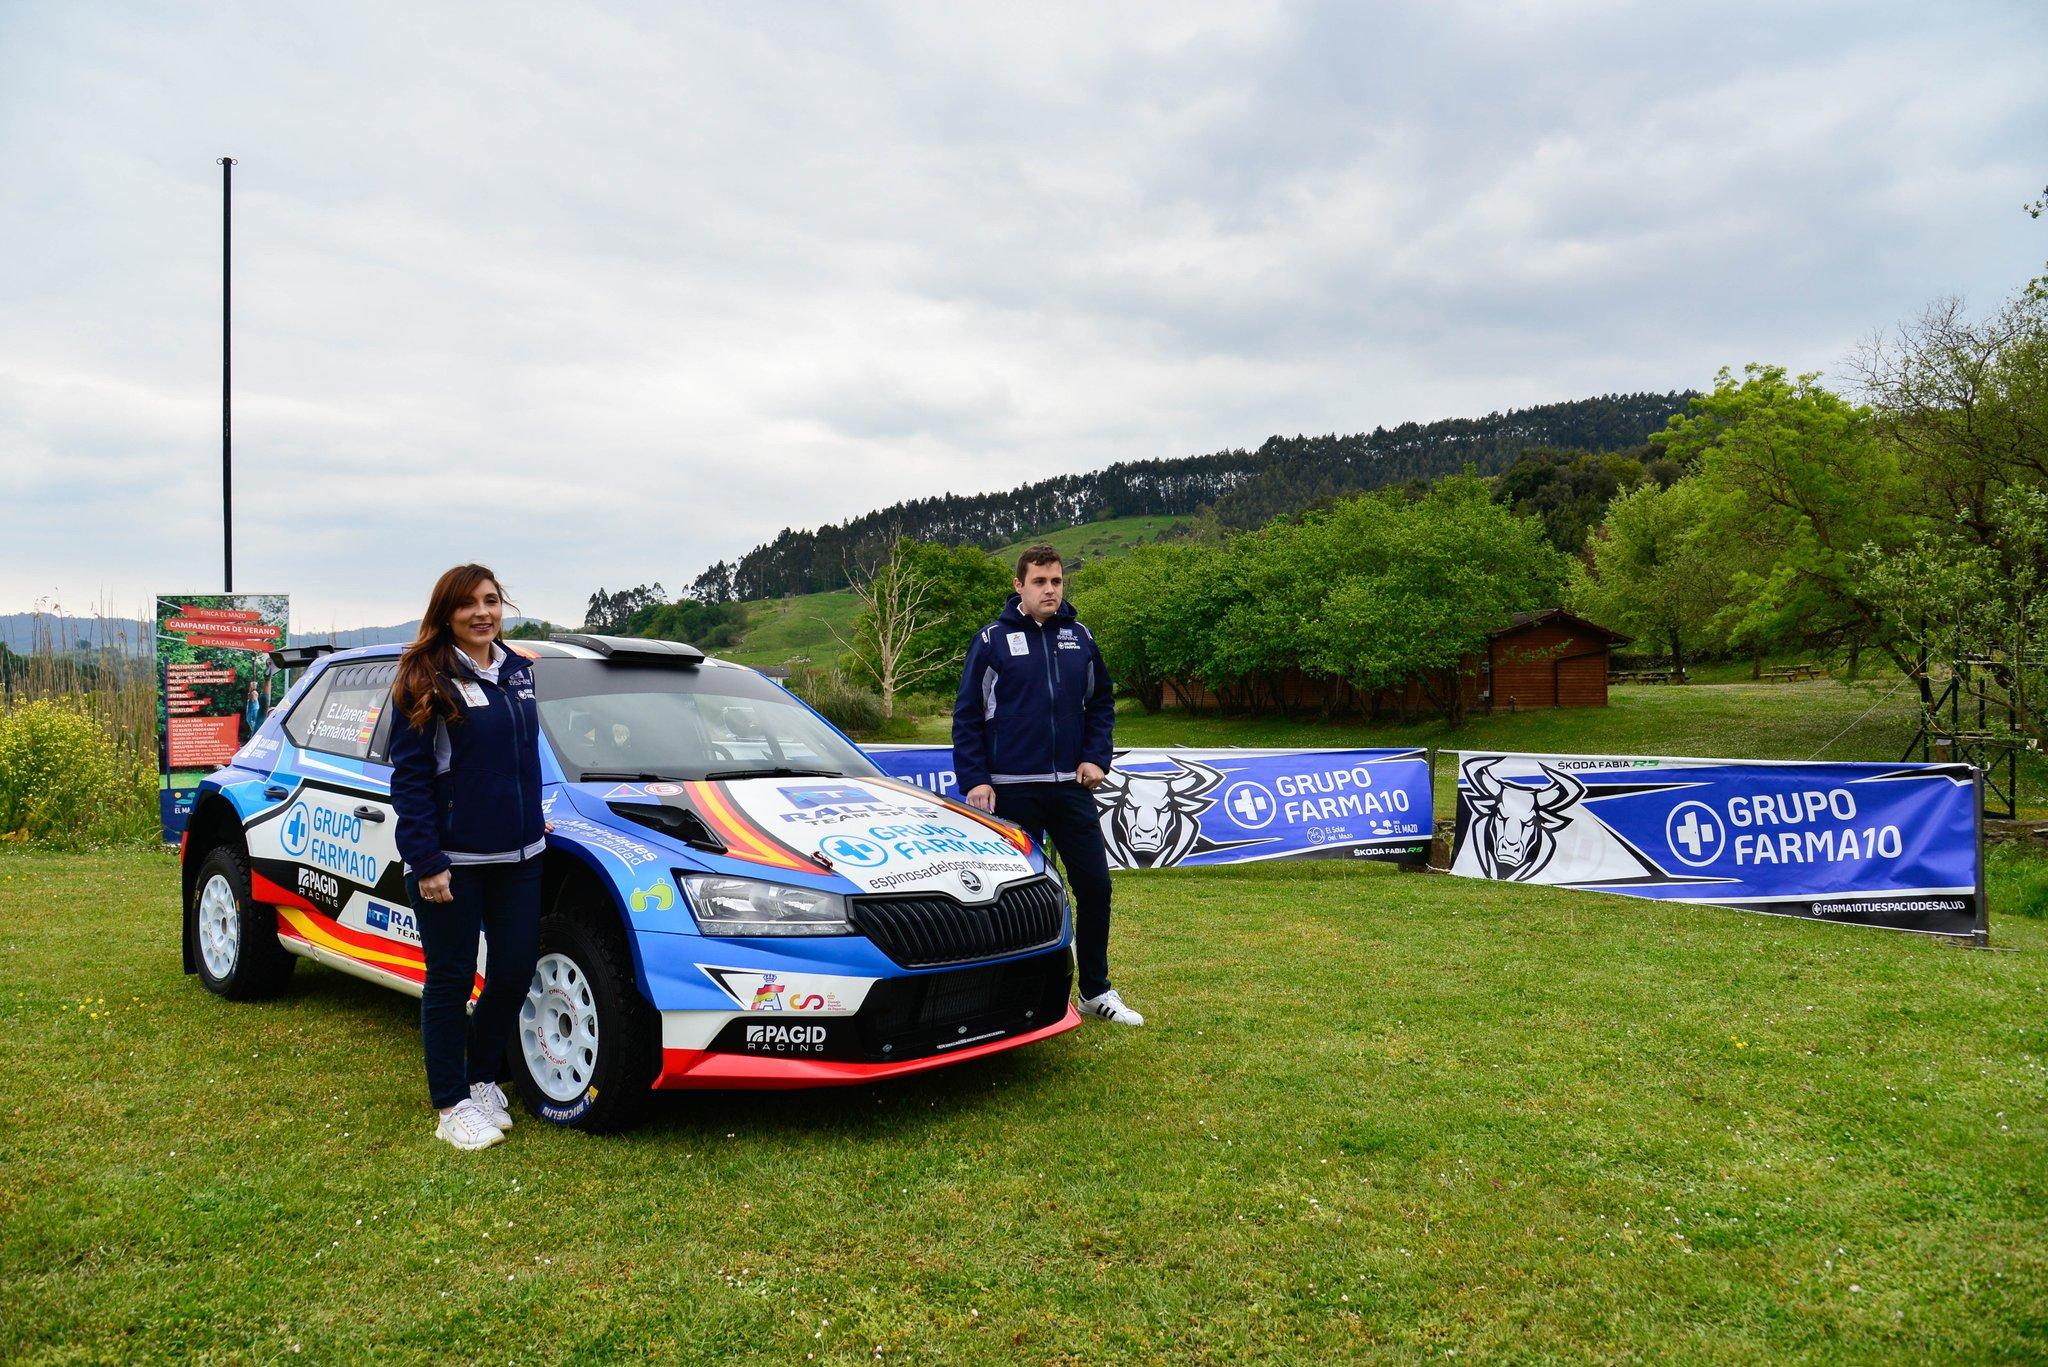 FIA European Rally Championship: Temporada 2021 - Página 6 EzMMmVmVkAM-brU?format=jpg&name=large